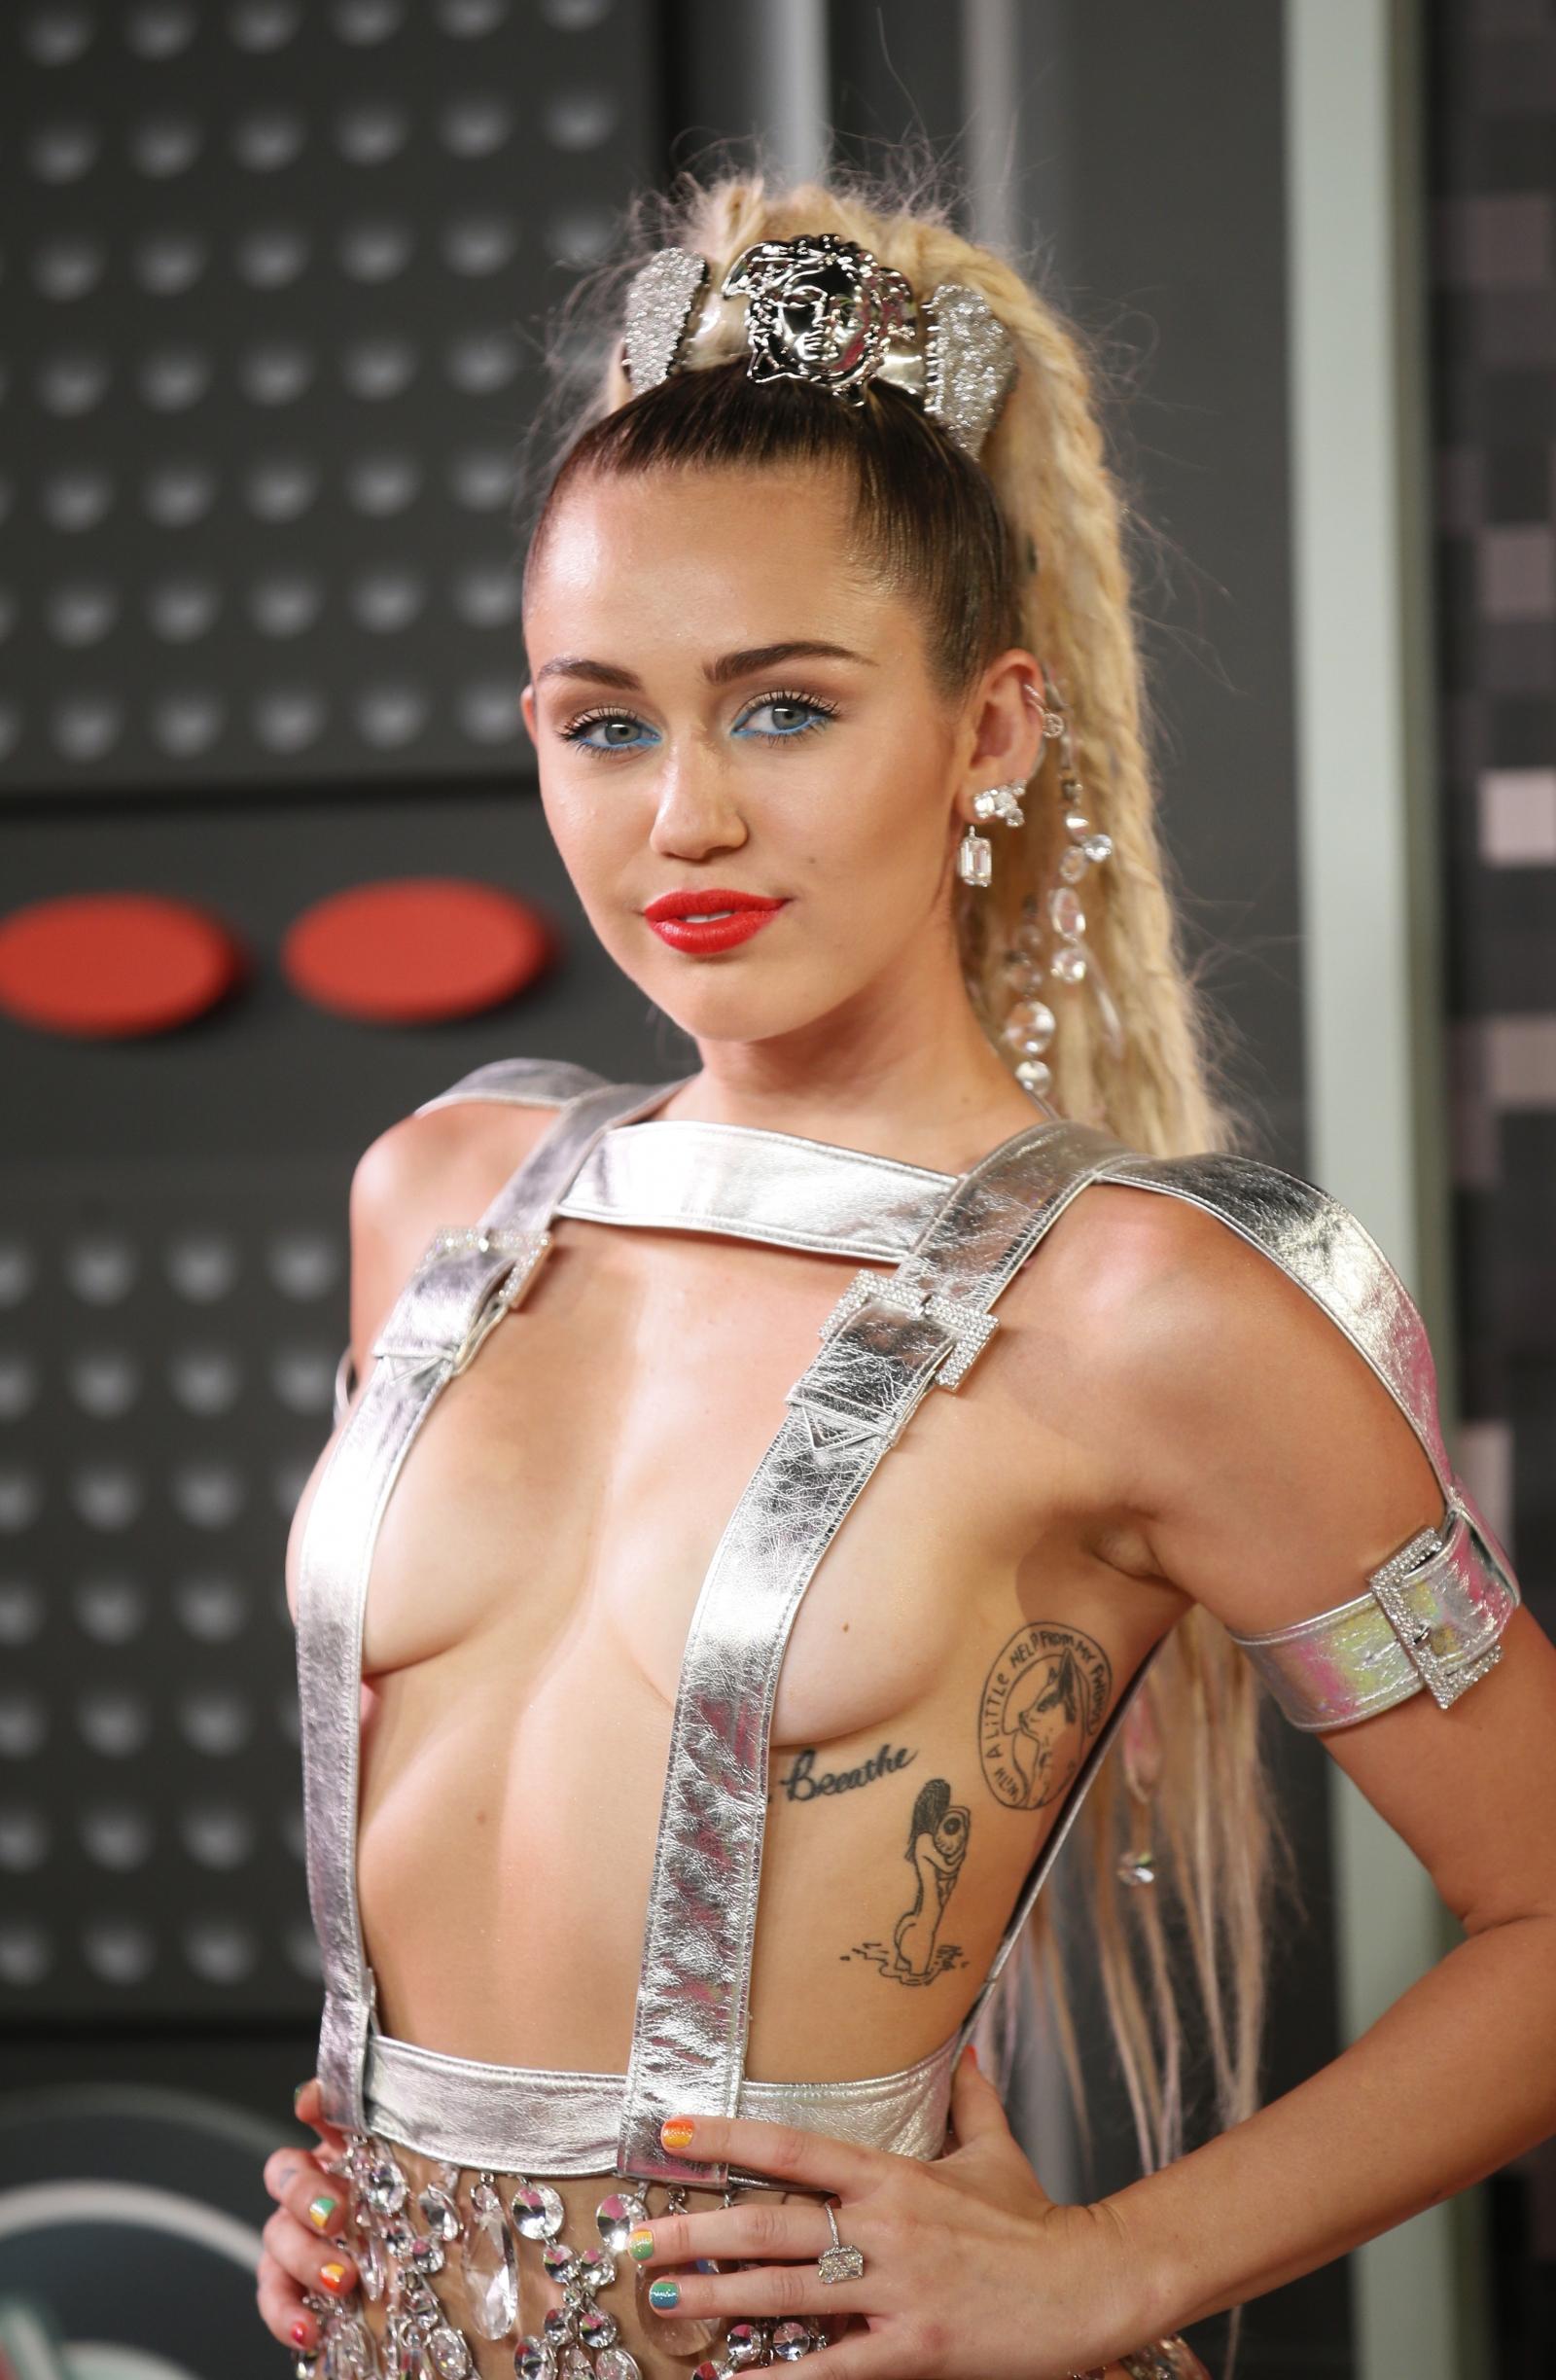 Nipple miley cyrus bikini